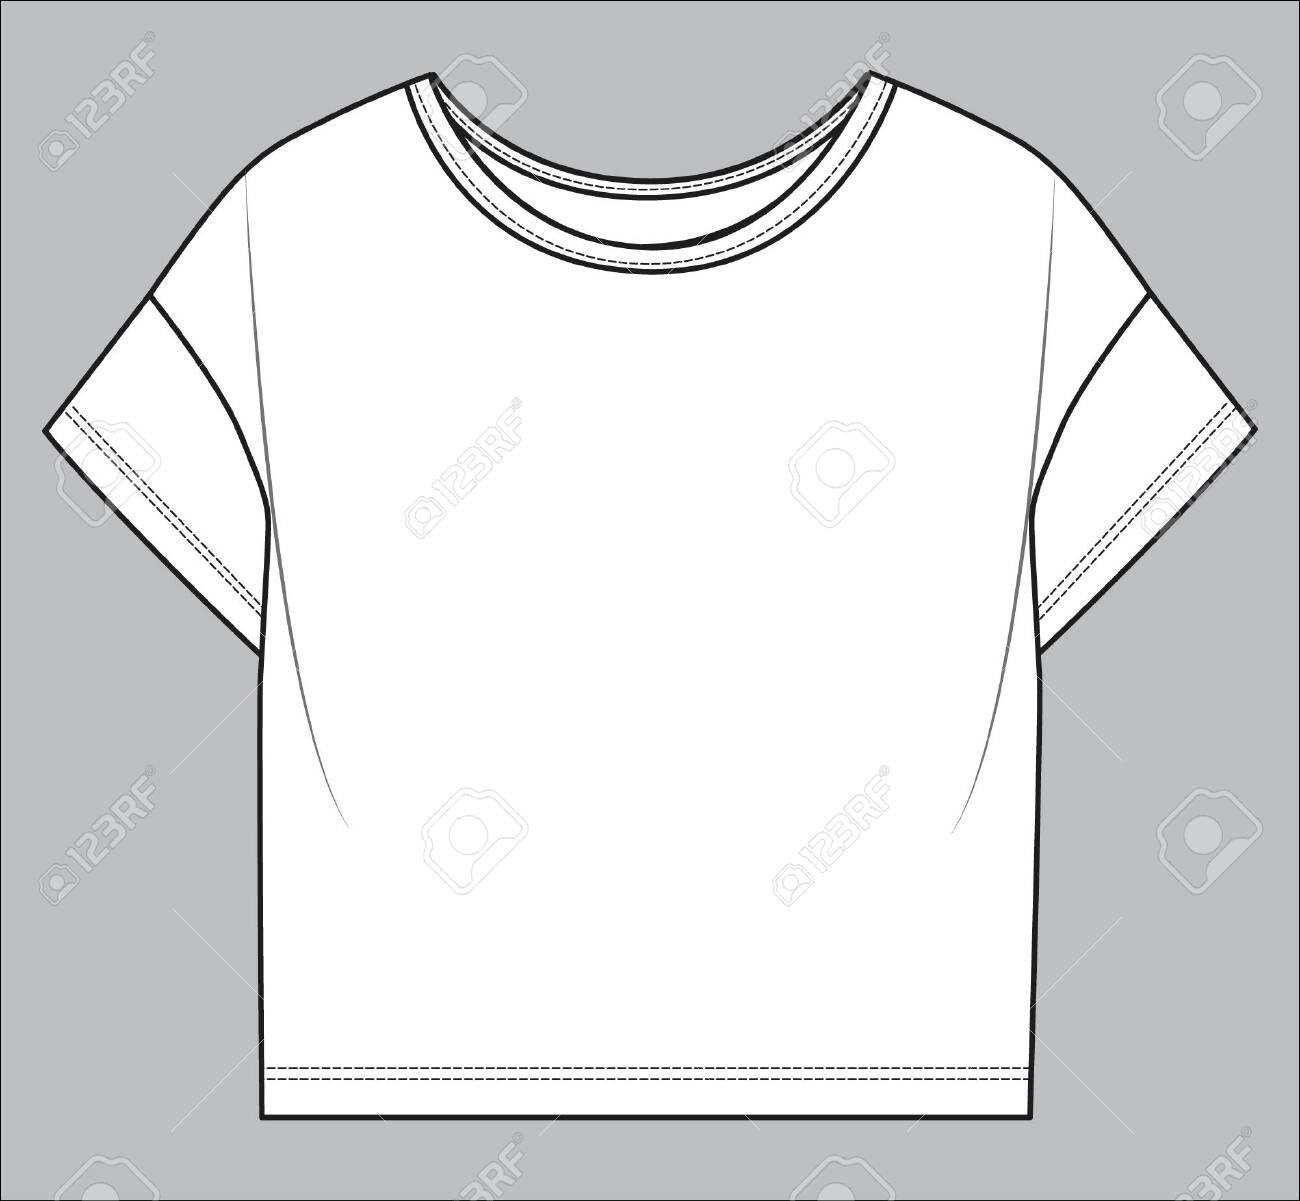 003 Amazing T Shirt Design Template Free  Psd DownloadFull